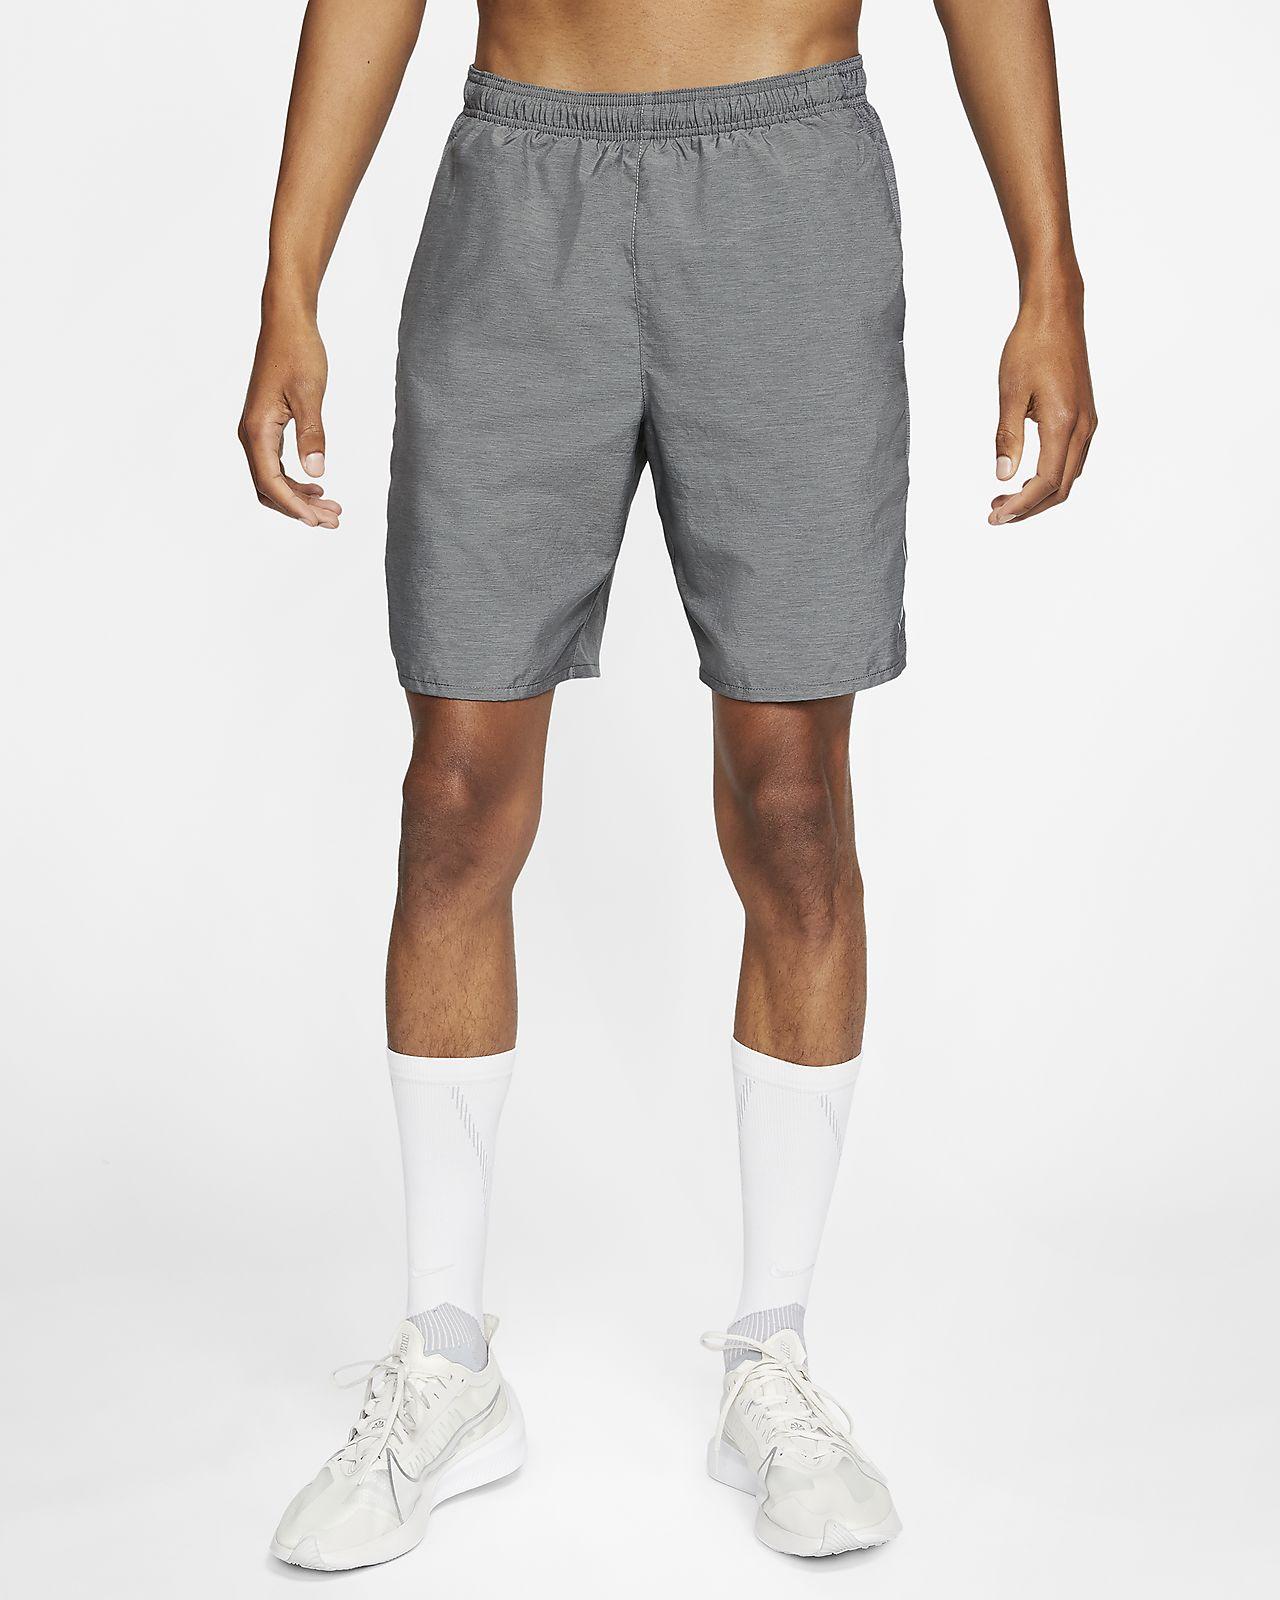 Shorts da running con slip 23 cm Nike Challenger - Uomo